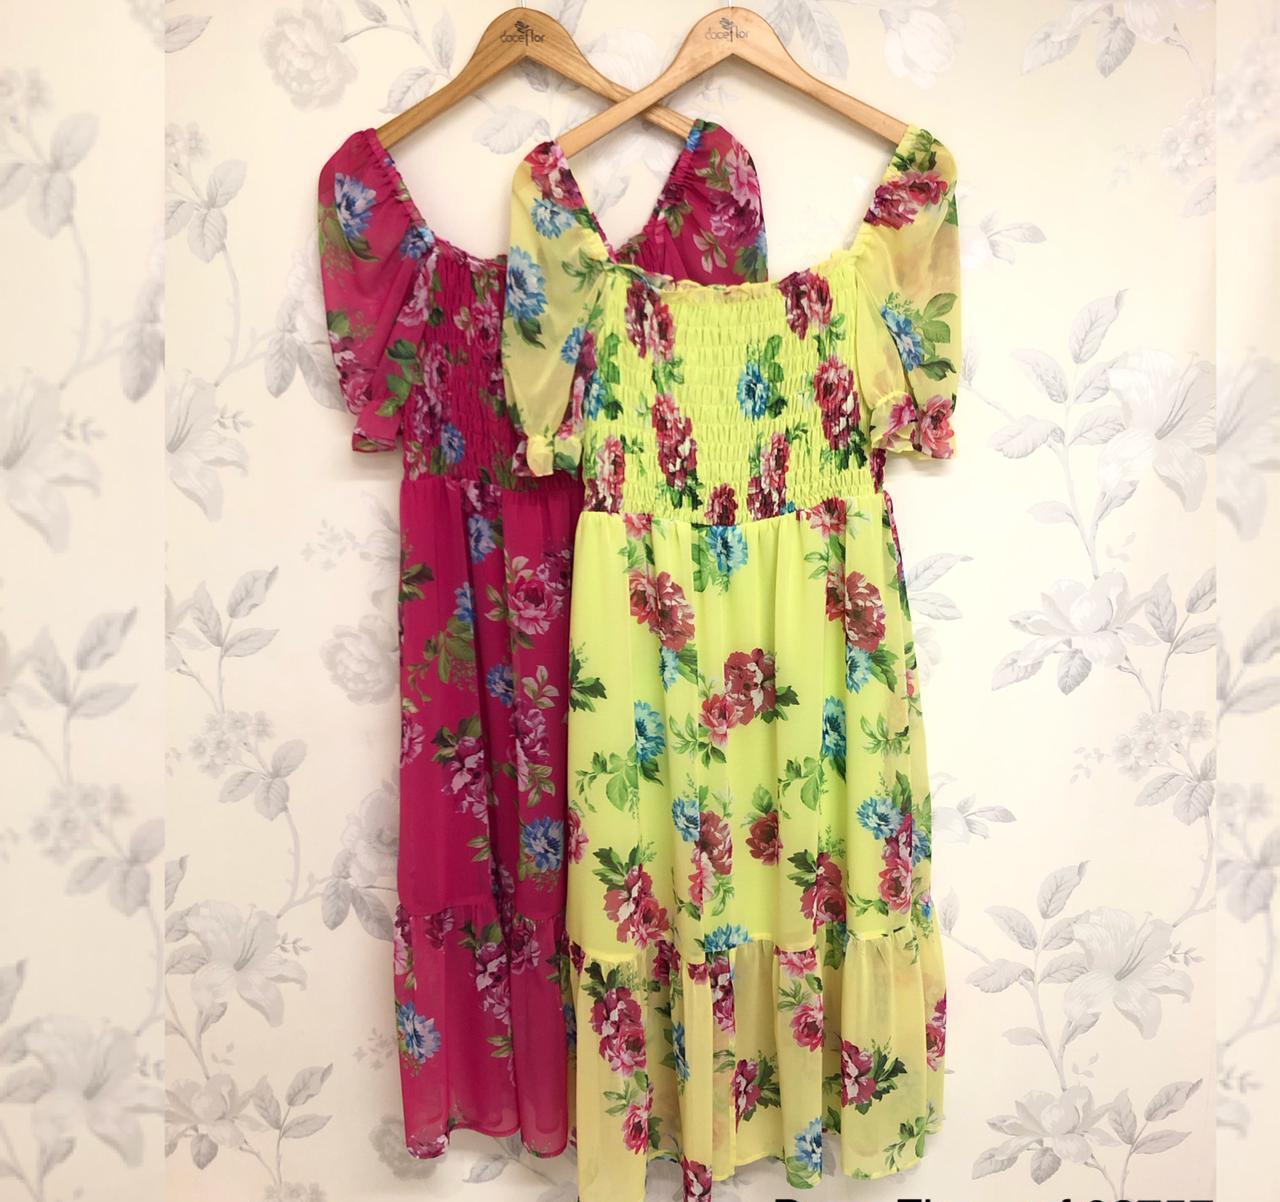 Vestido Adele Crepe Midi Floral Detalhe Lastex